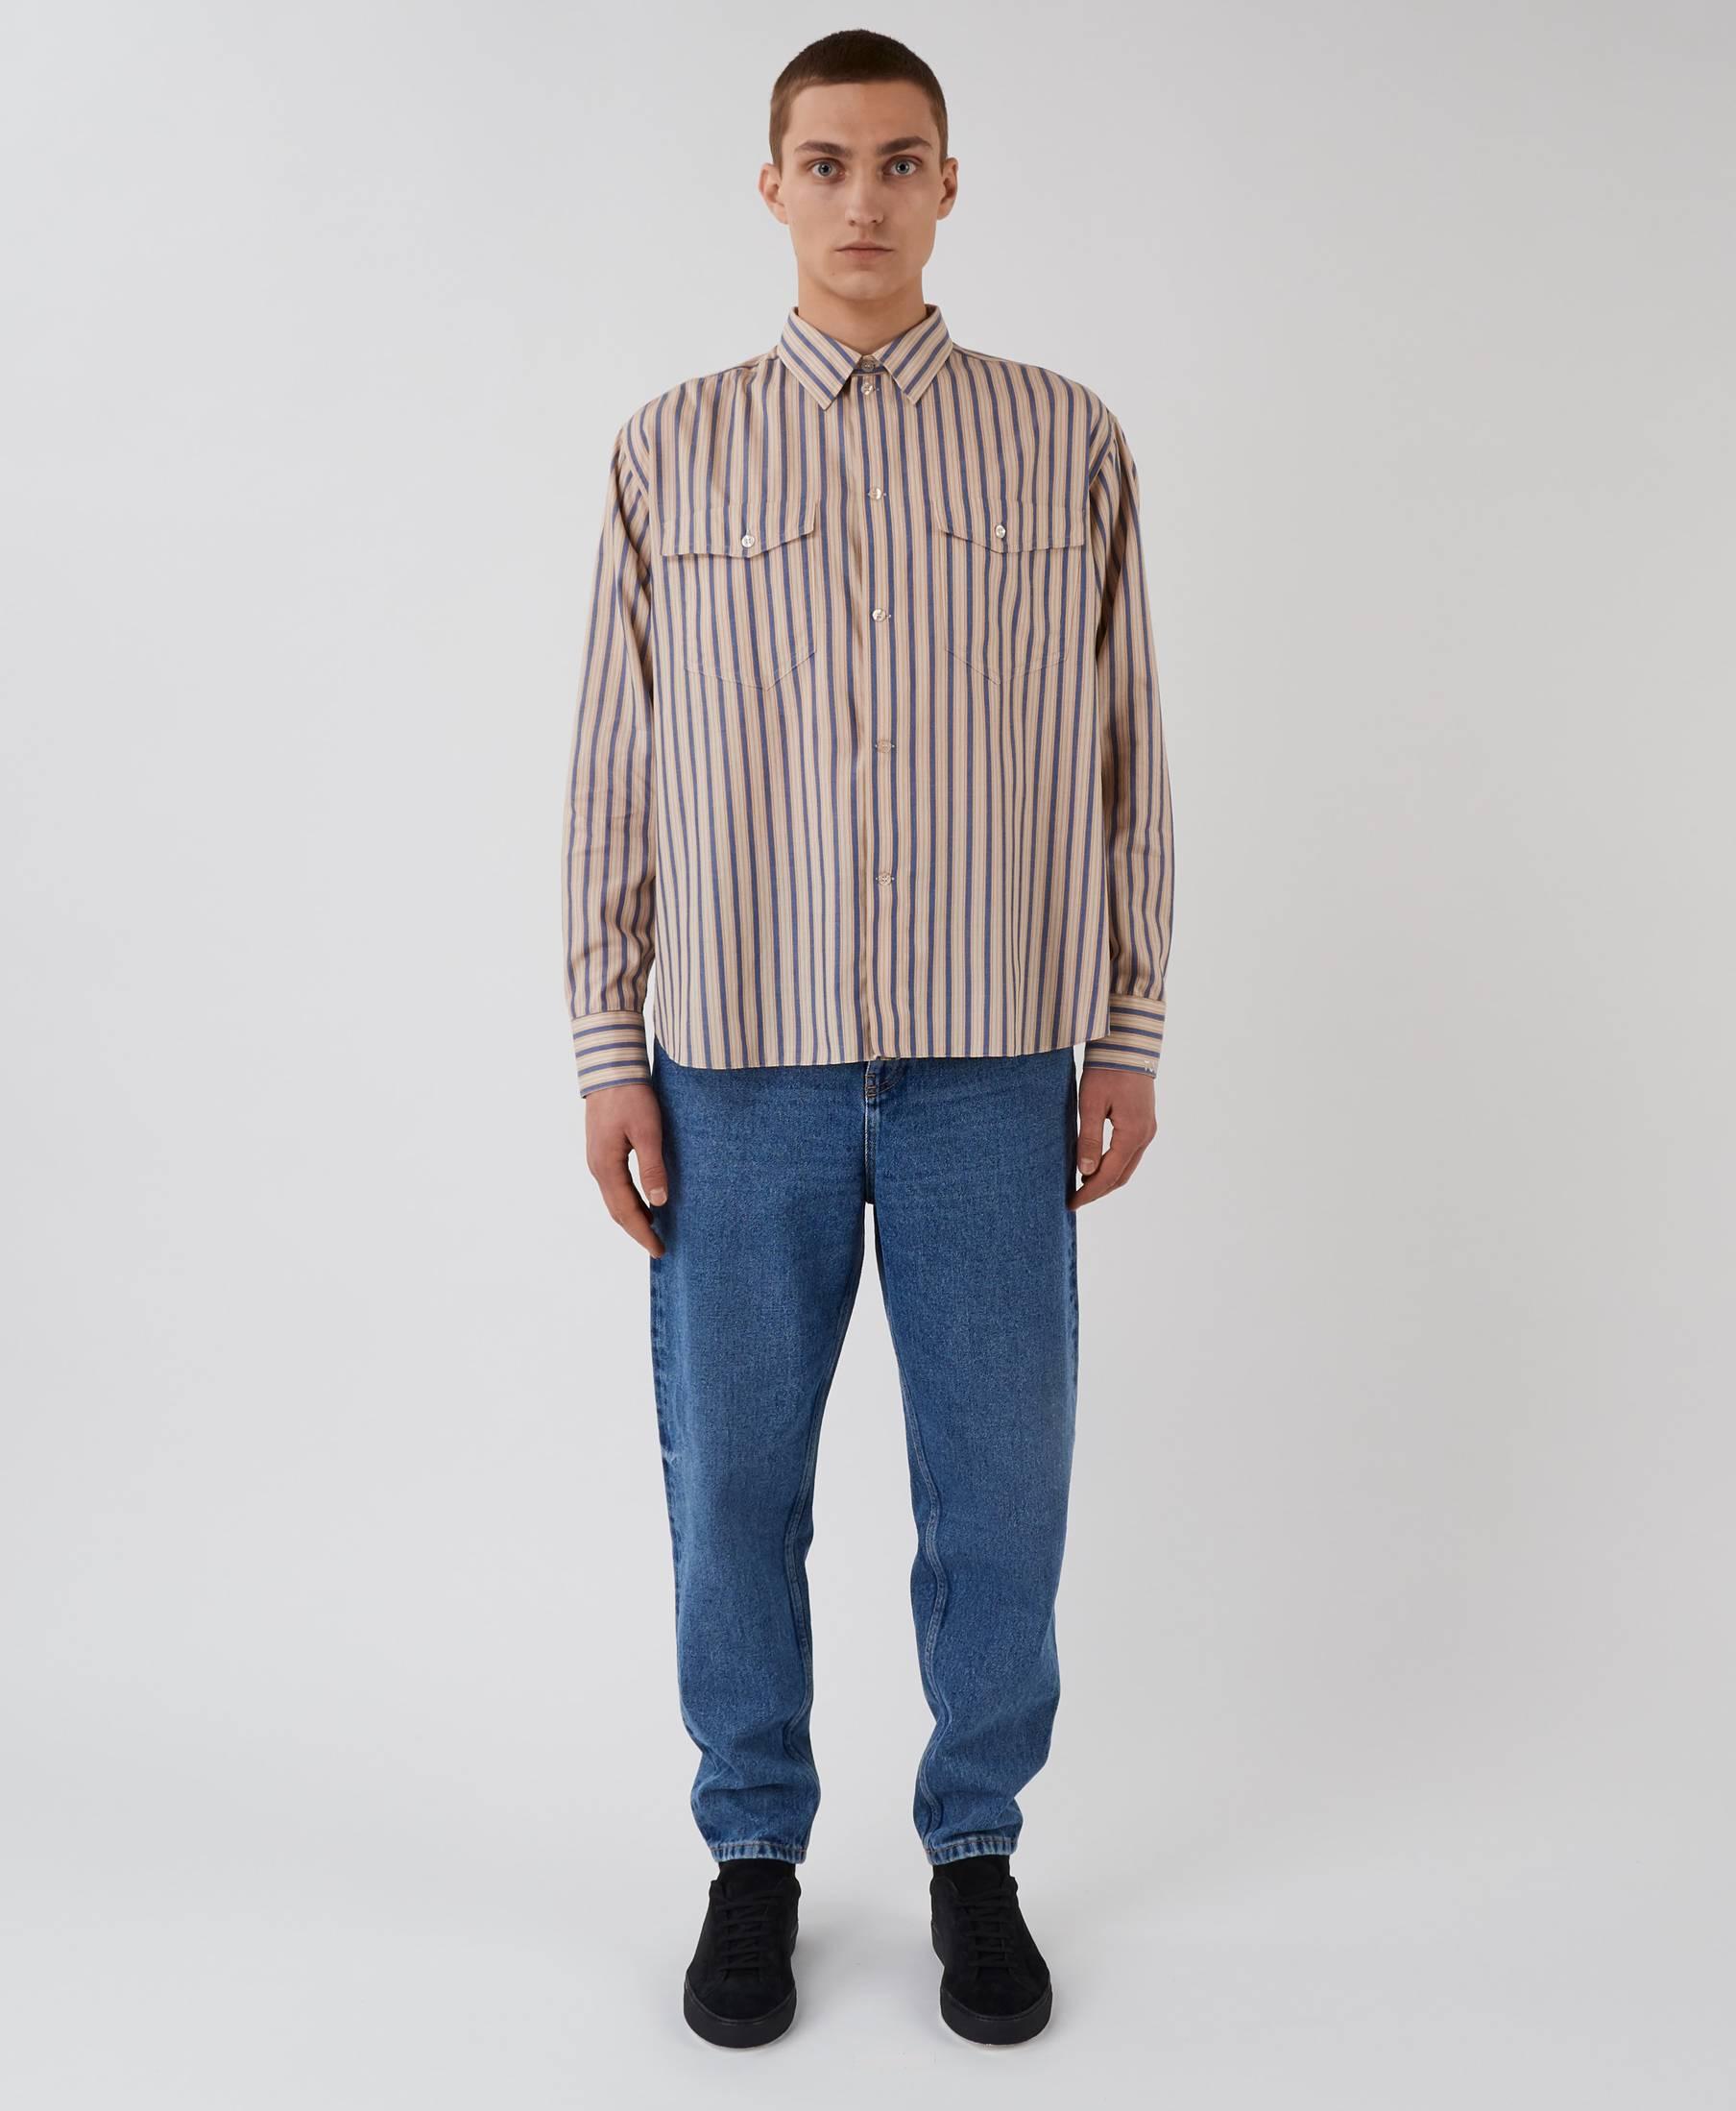 Monday Shirt Blue Stripes